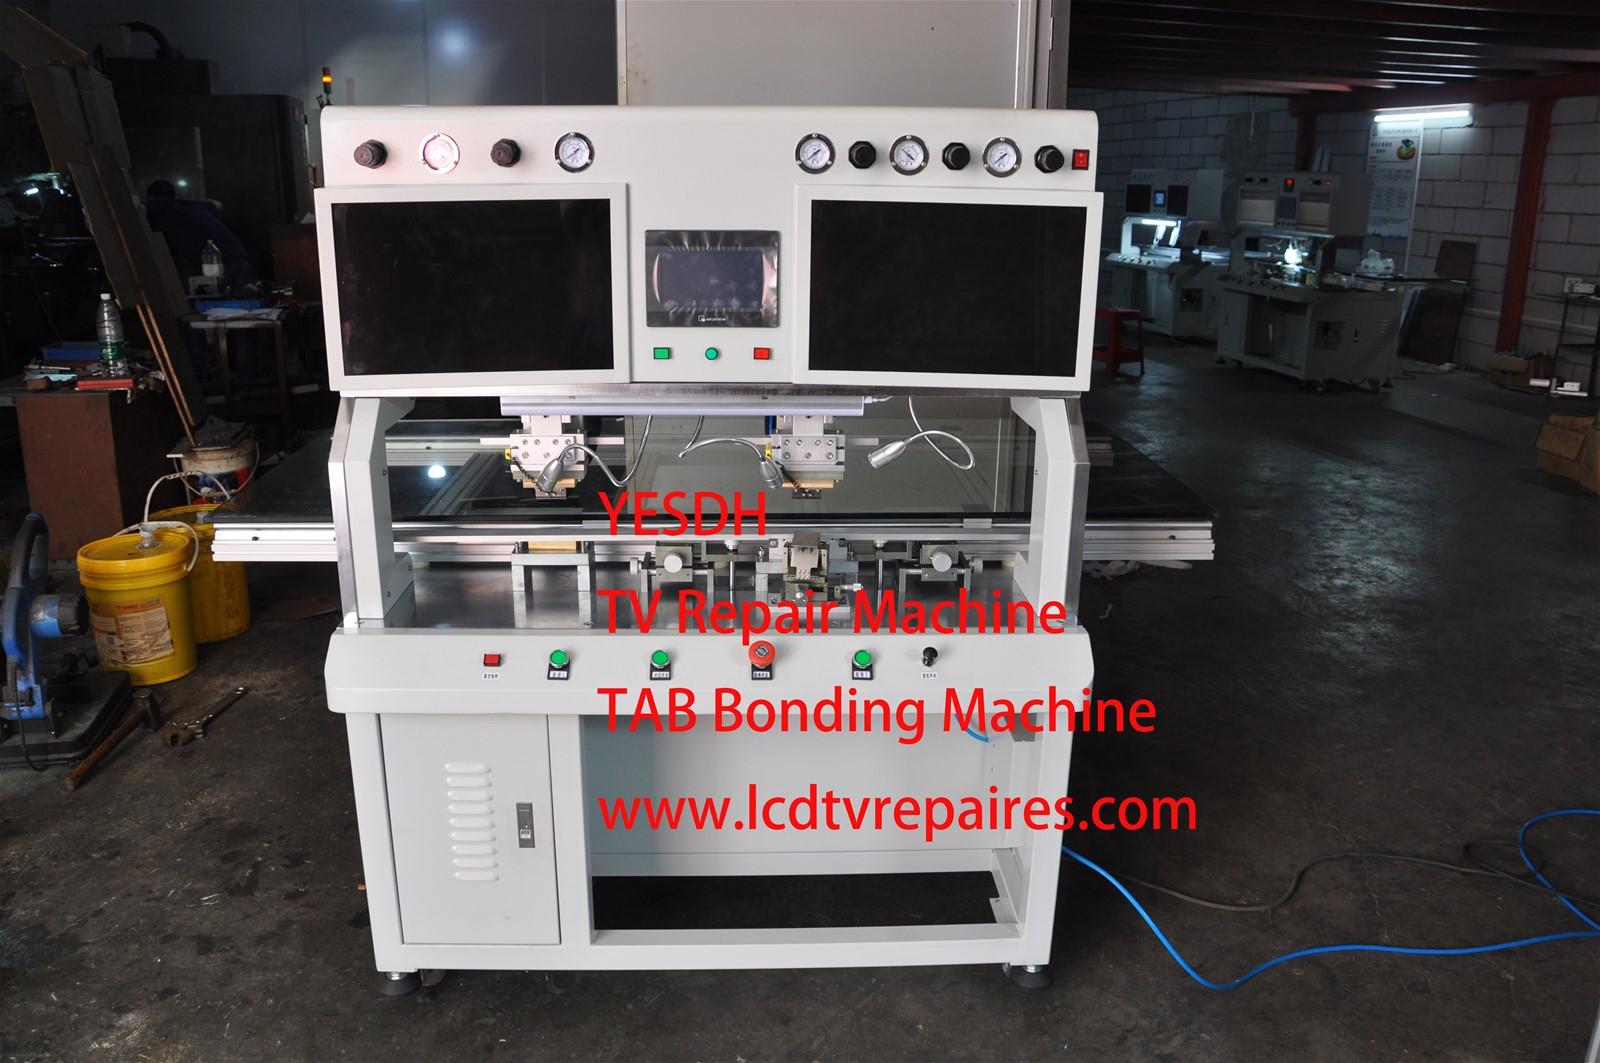 1ac4889863fbf5 LCD Television Screen Repair ACF Bonding Machine 208-D Technical Parameters  power: AC220V±10%, 50Hz, 1200W LCD size: 15